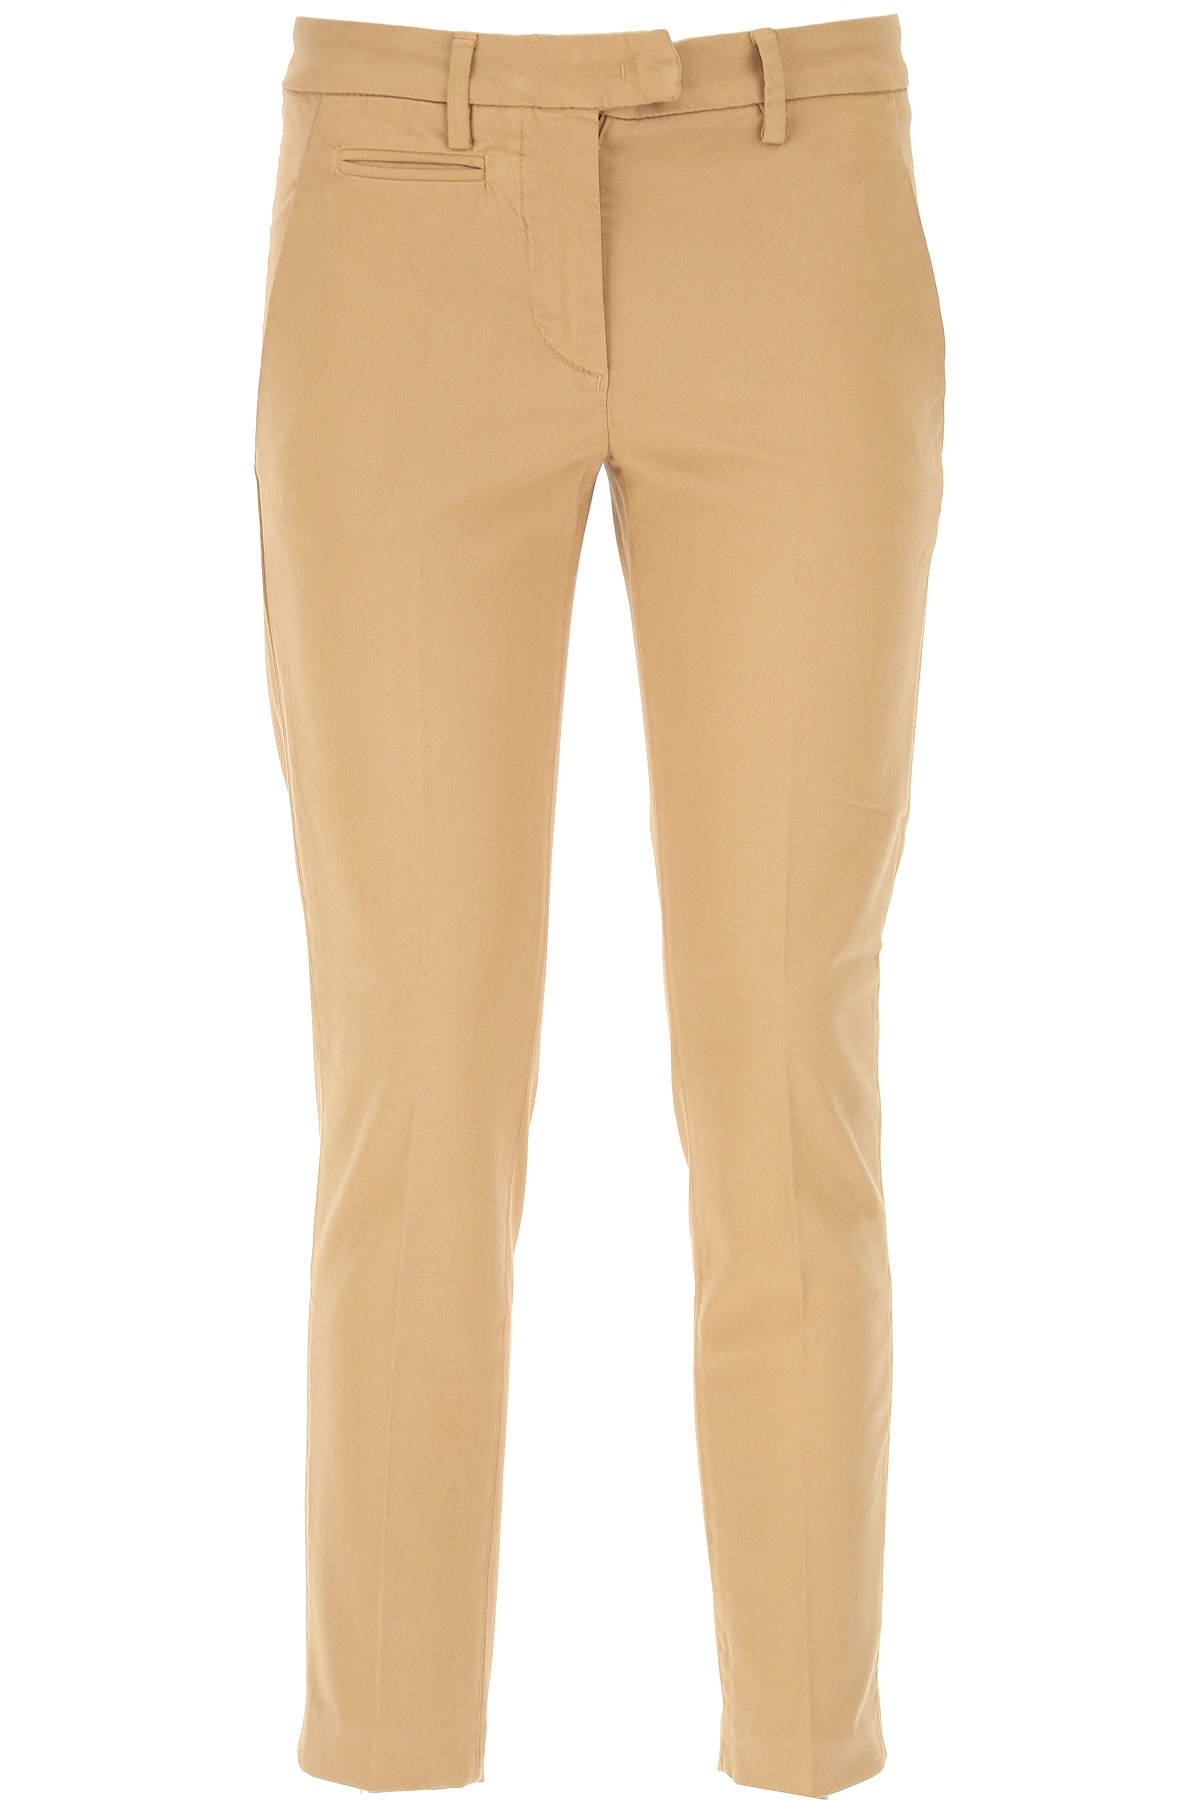 Dondup Pants for Women On Sale, Camel, Cotton, 2017, 26 28 30 32